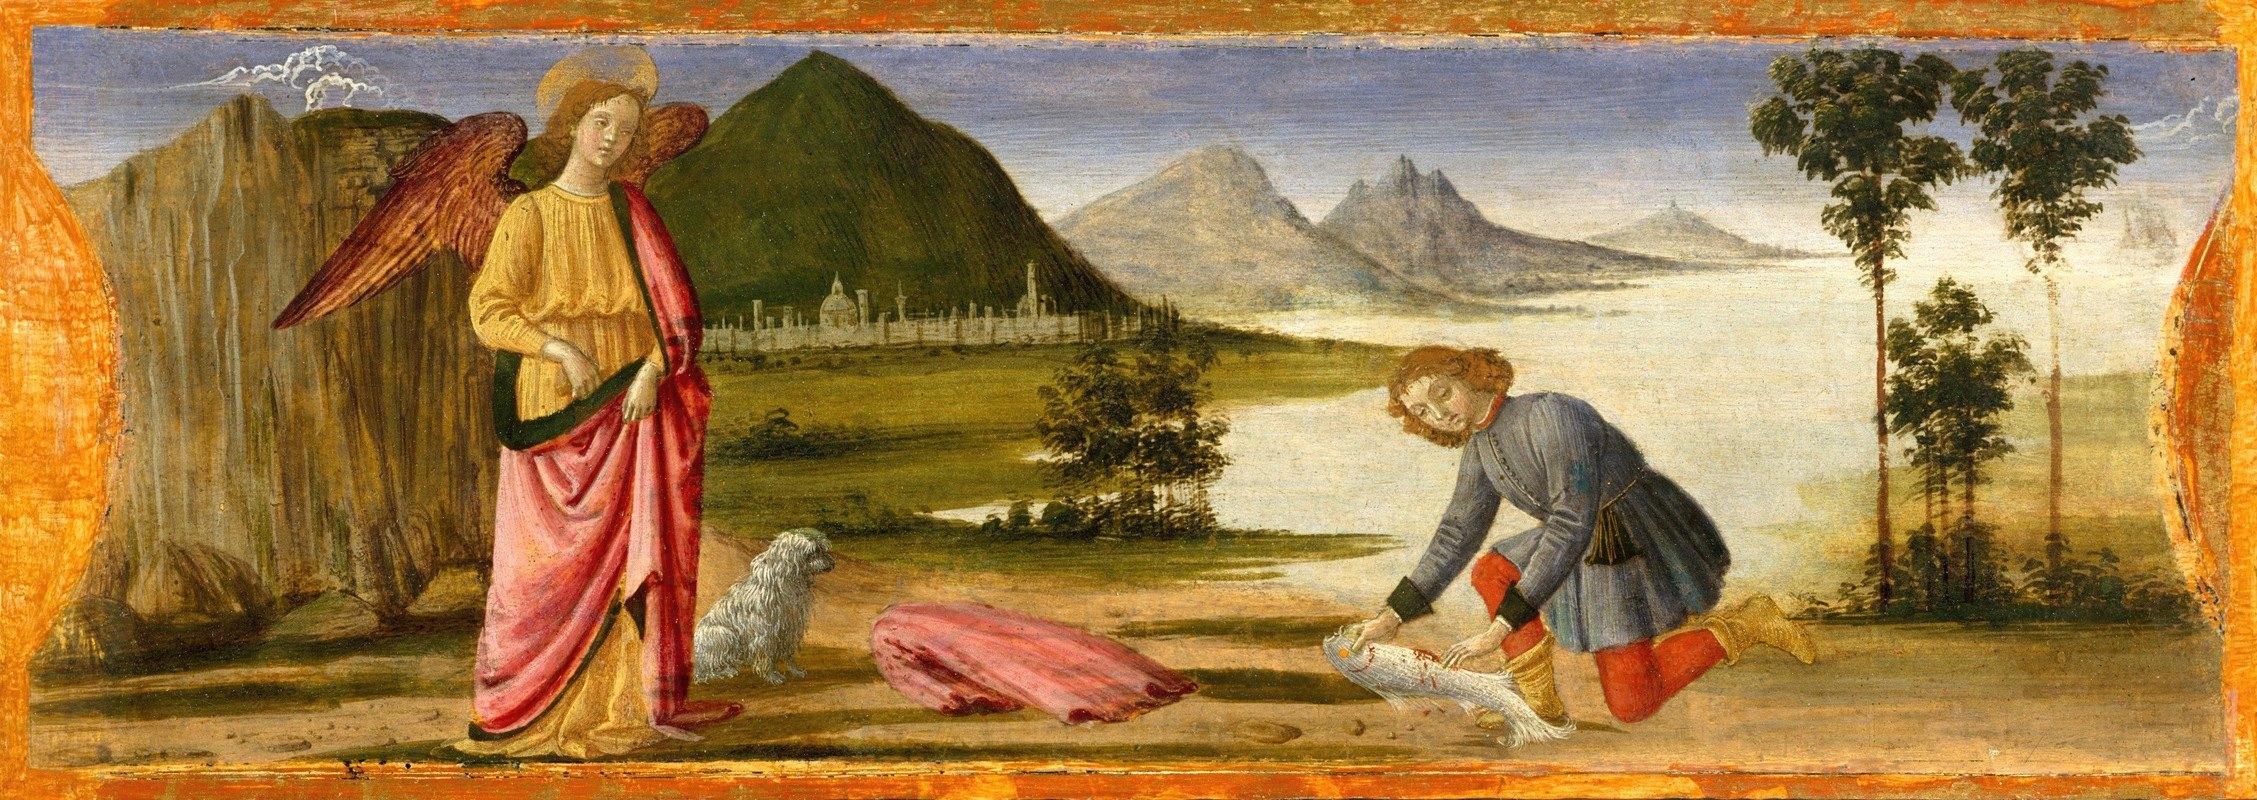 Davide Ghirlandaio - Tobias and the Angel